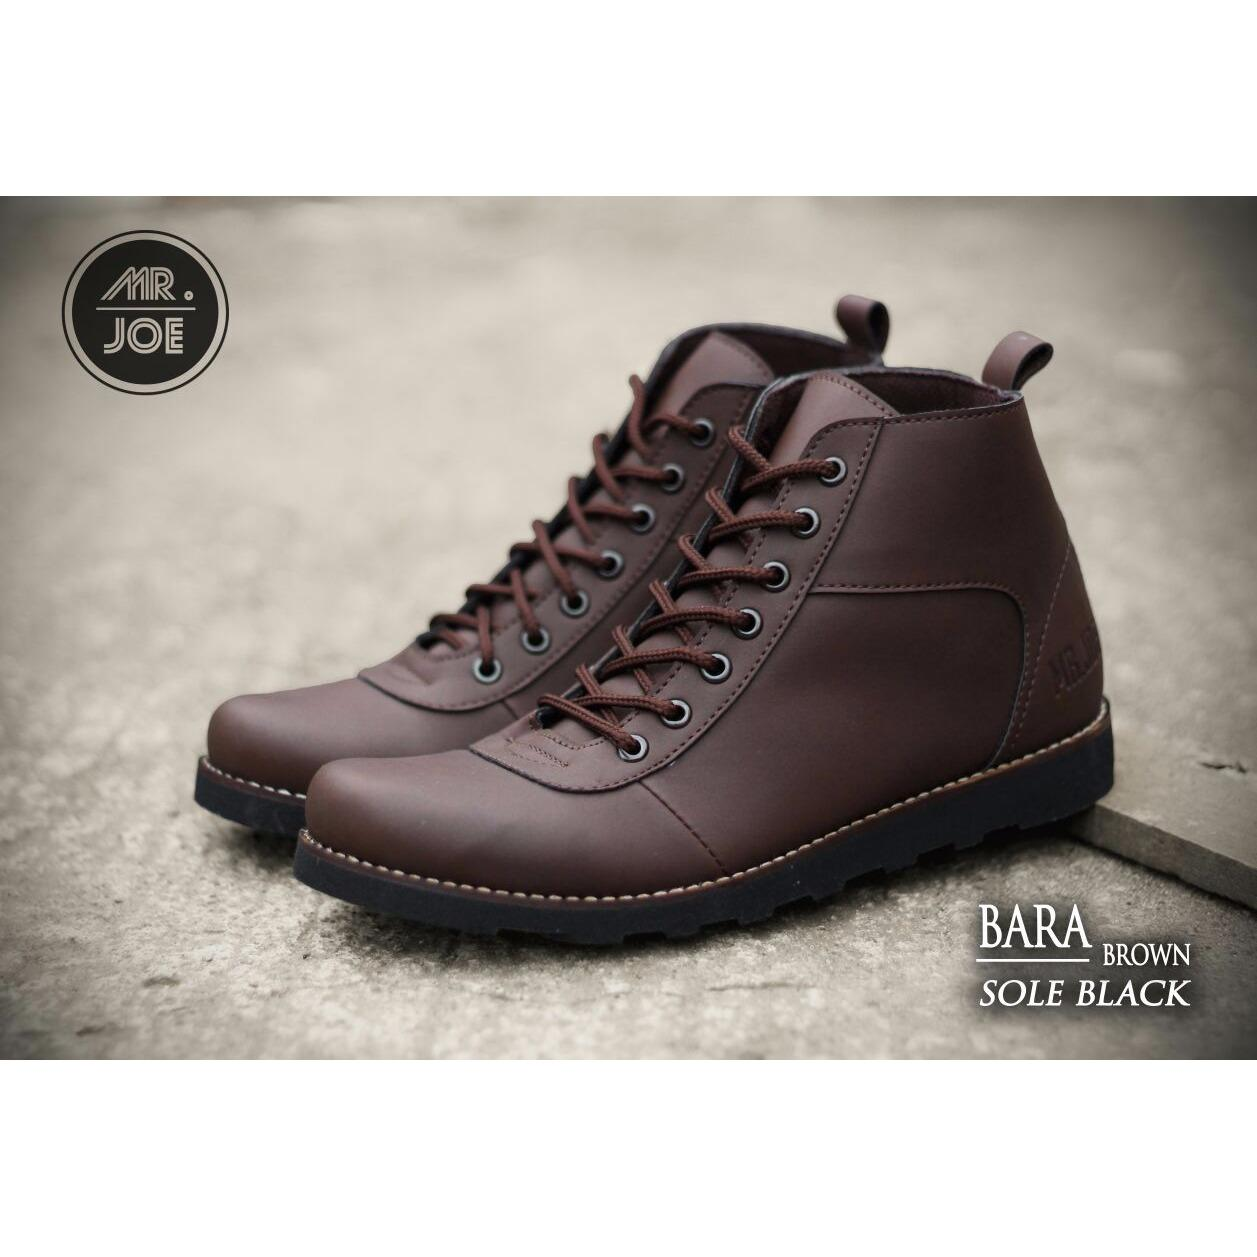 HOT BRODO Boots Low  Sepatu Brodo Boots Mr Joe Original - Sepatu boots Pria - Sepatu Boots pria - Sepatu original Mr Joe ORIGINAL